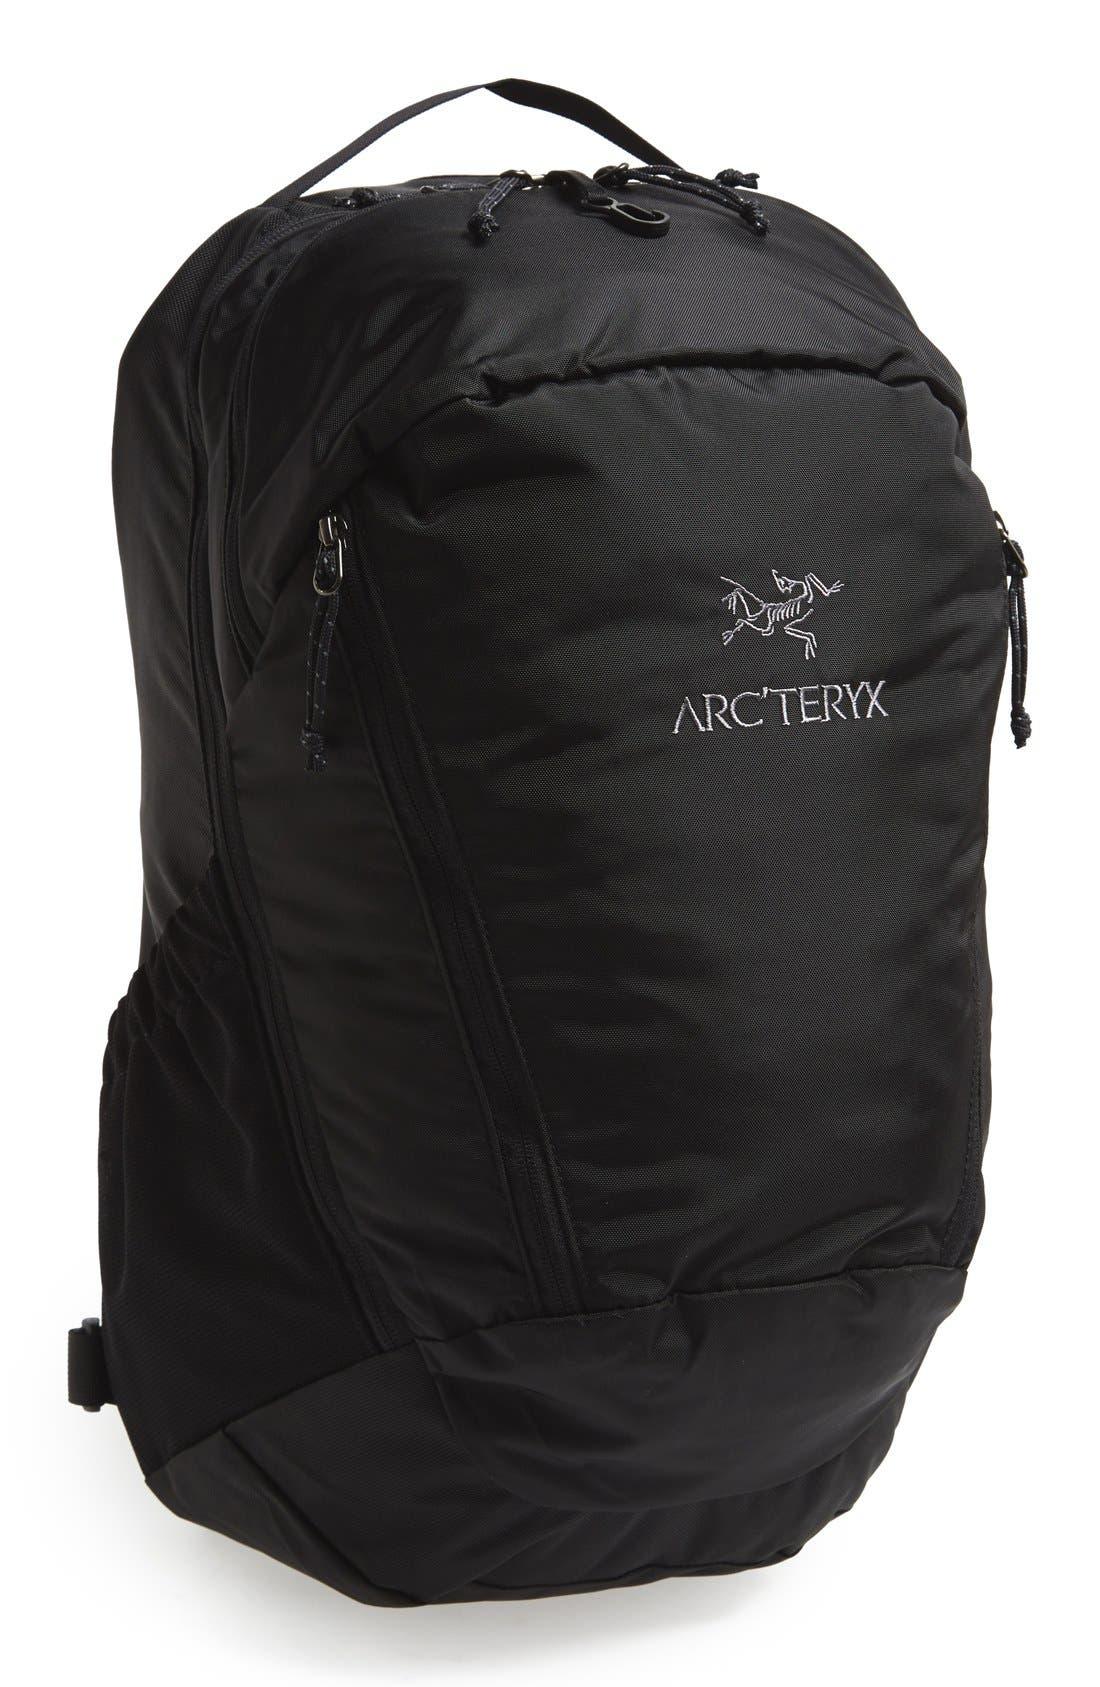 ARC'TERYX 'Mantis 26L' Backpack, Main, color, 001